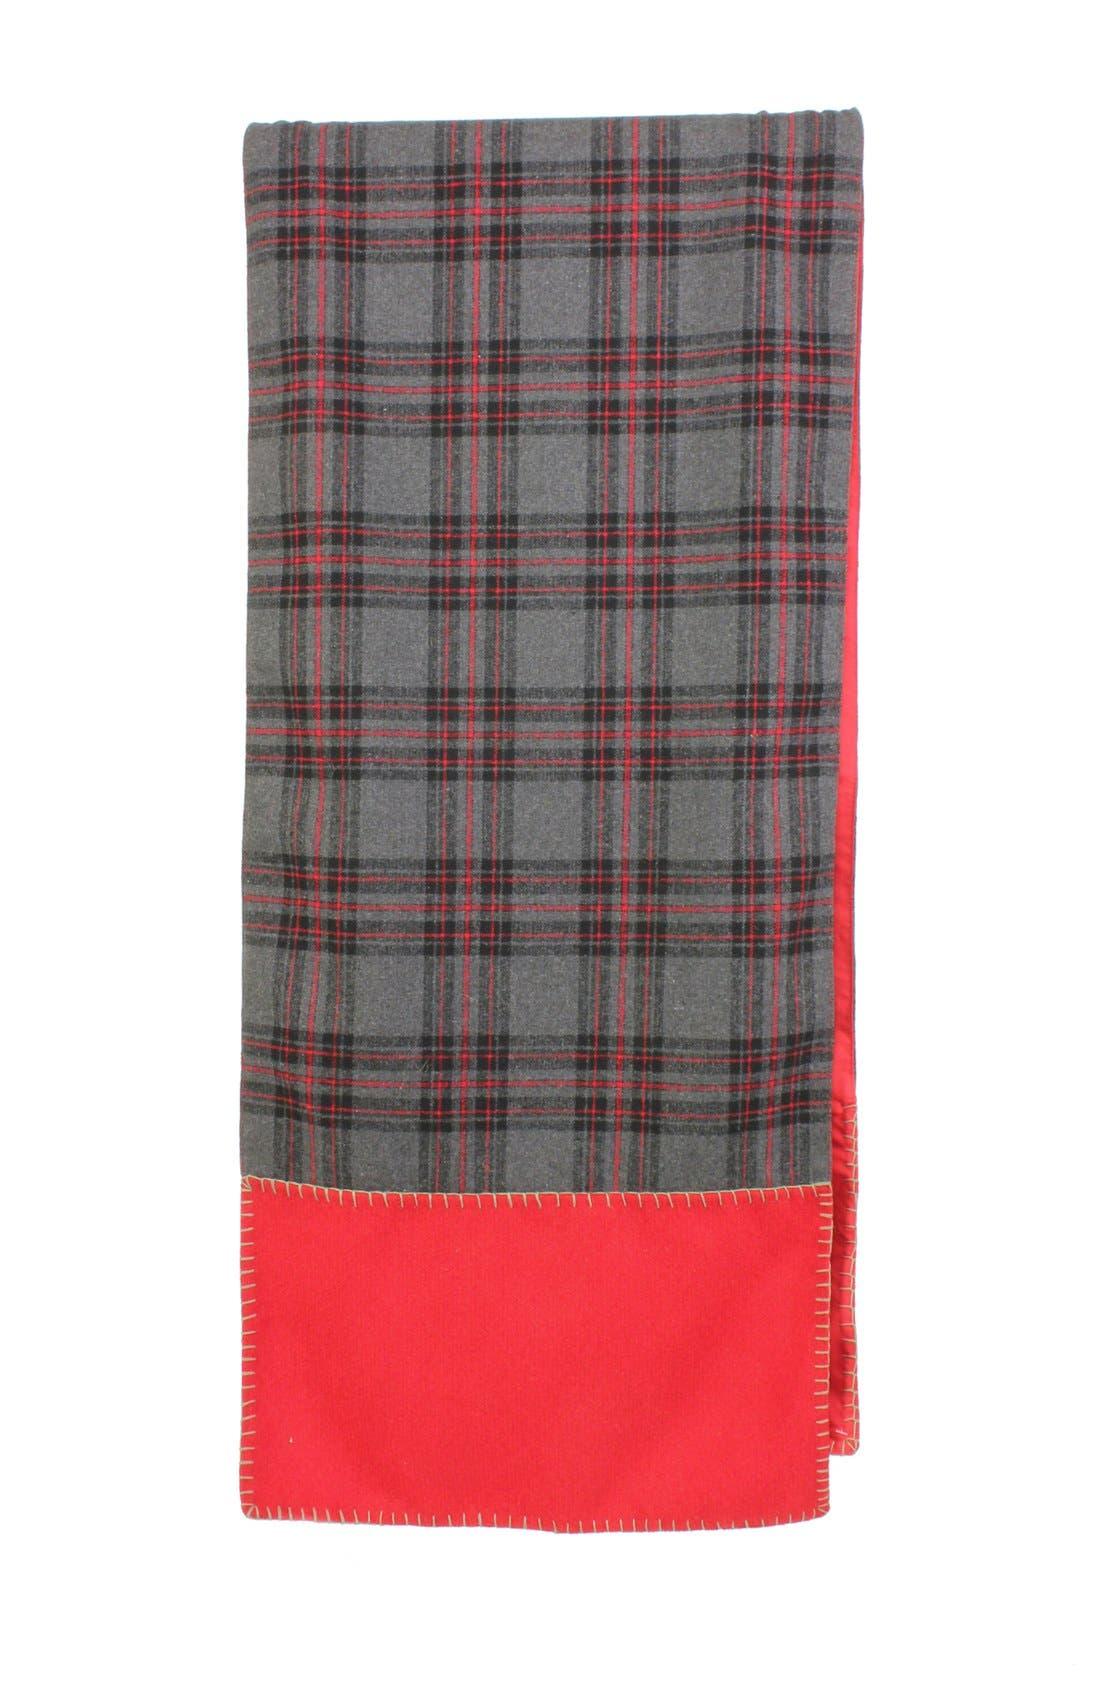 Alternate Image 1 Selected - Sage & Co. Plaid Wool Table Runner